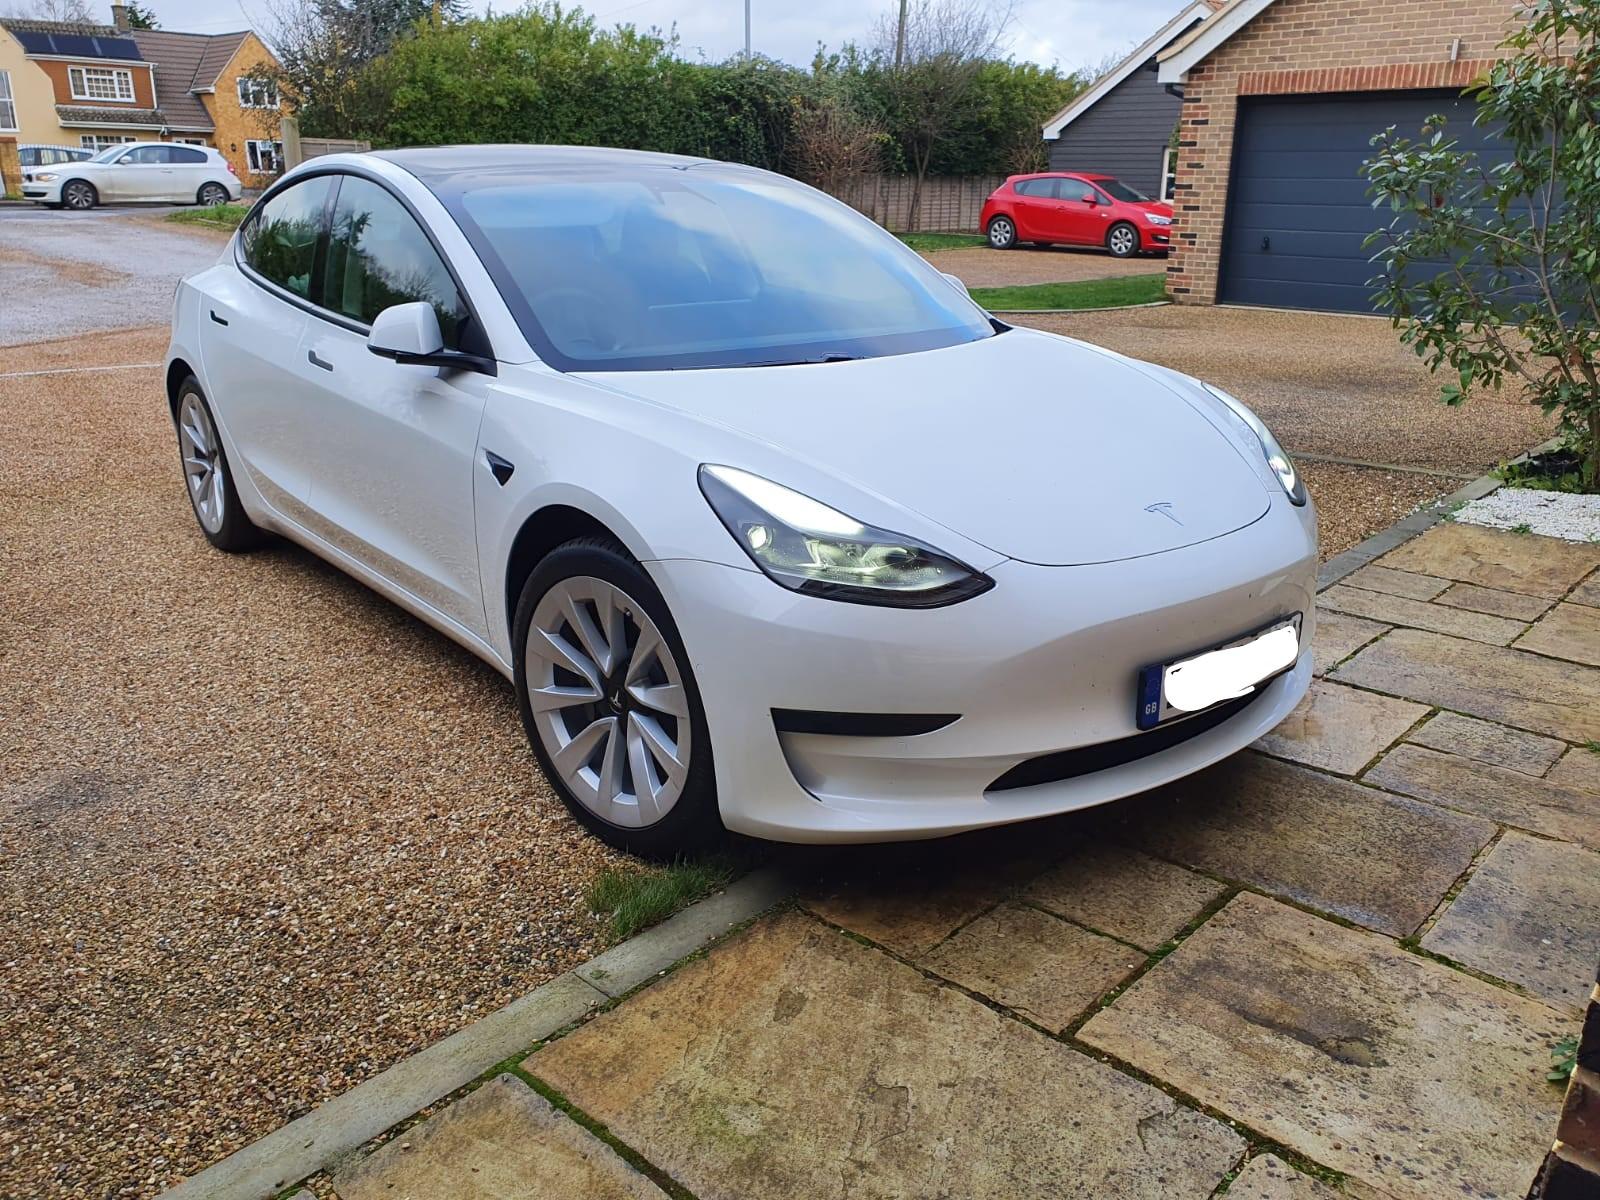 Tesla Model 3 Number Plate.jpg